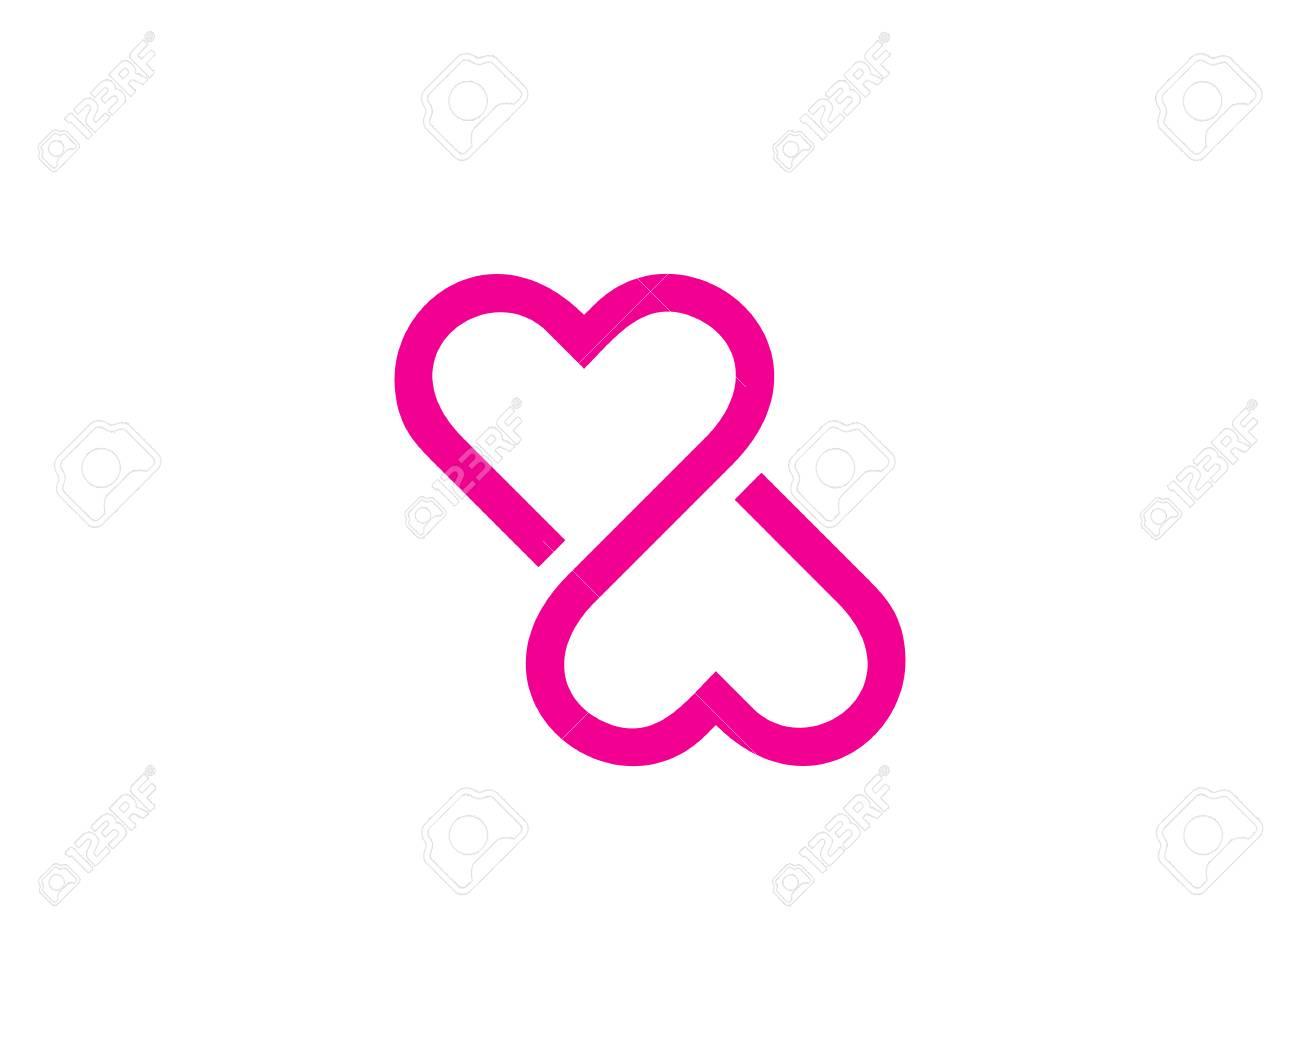 infinity love logo design